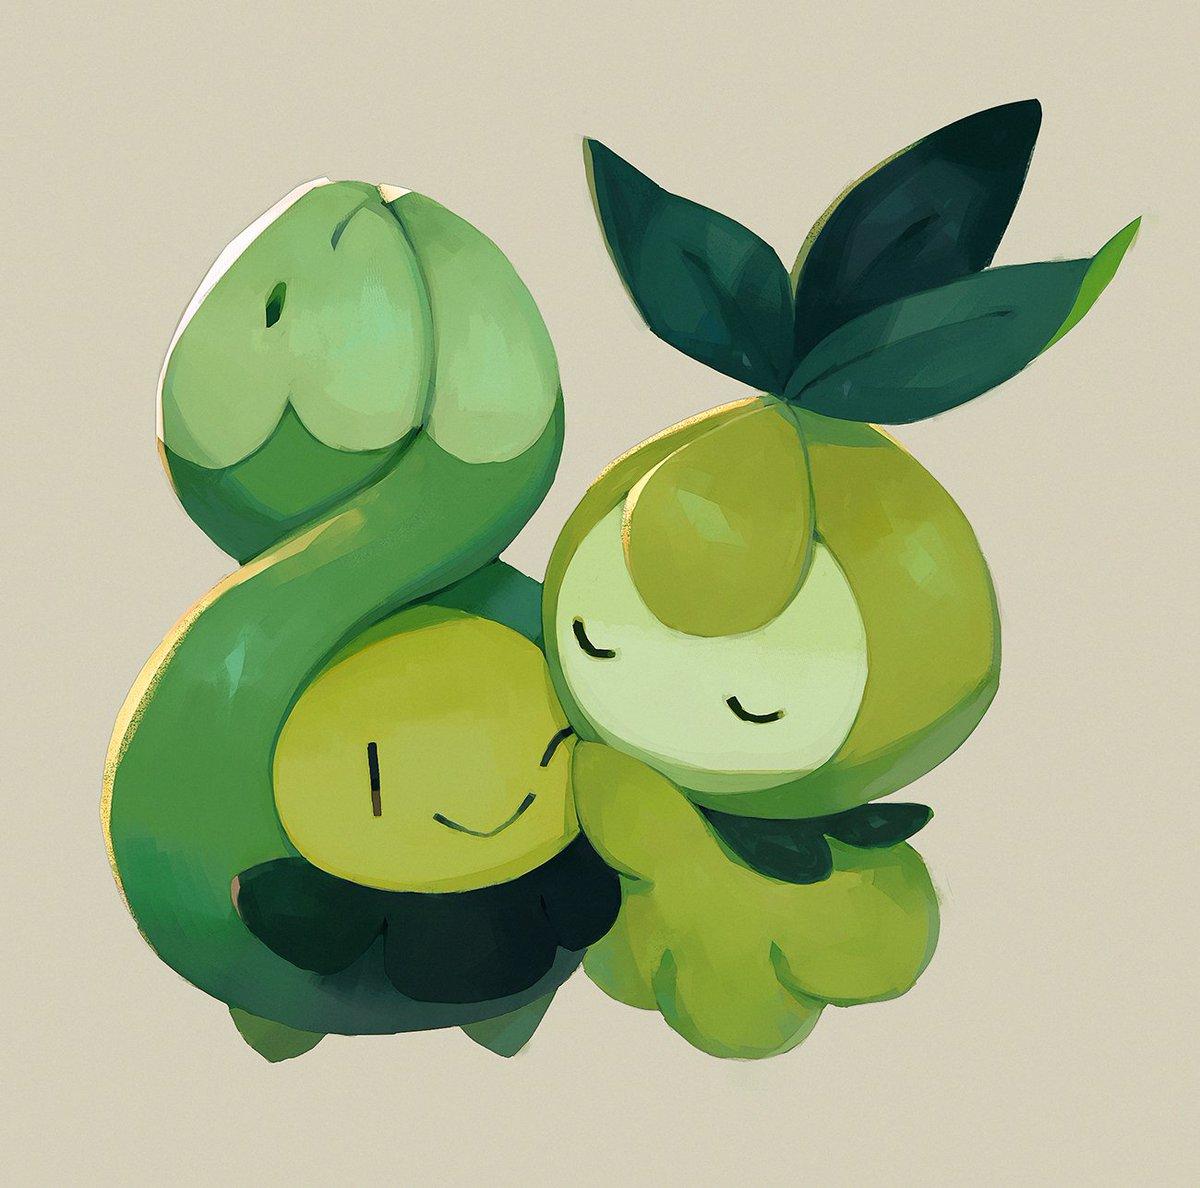 tiny plant friends 🌱